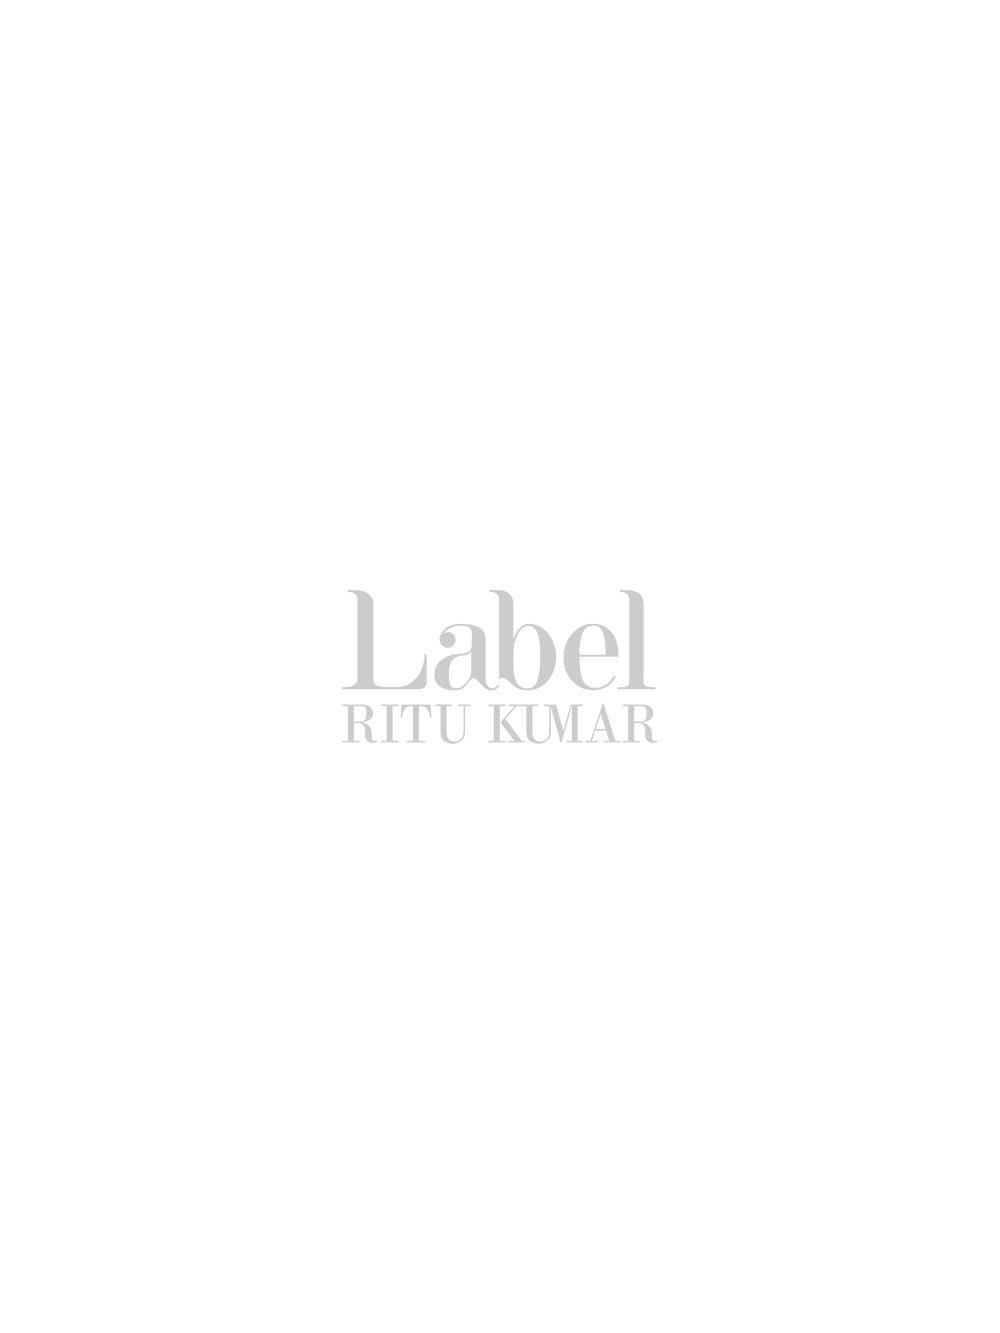 Chambray Blue & Maroon Embroidered Short Shirt Dress